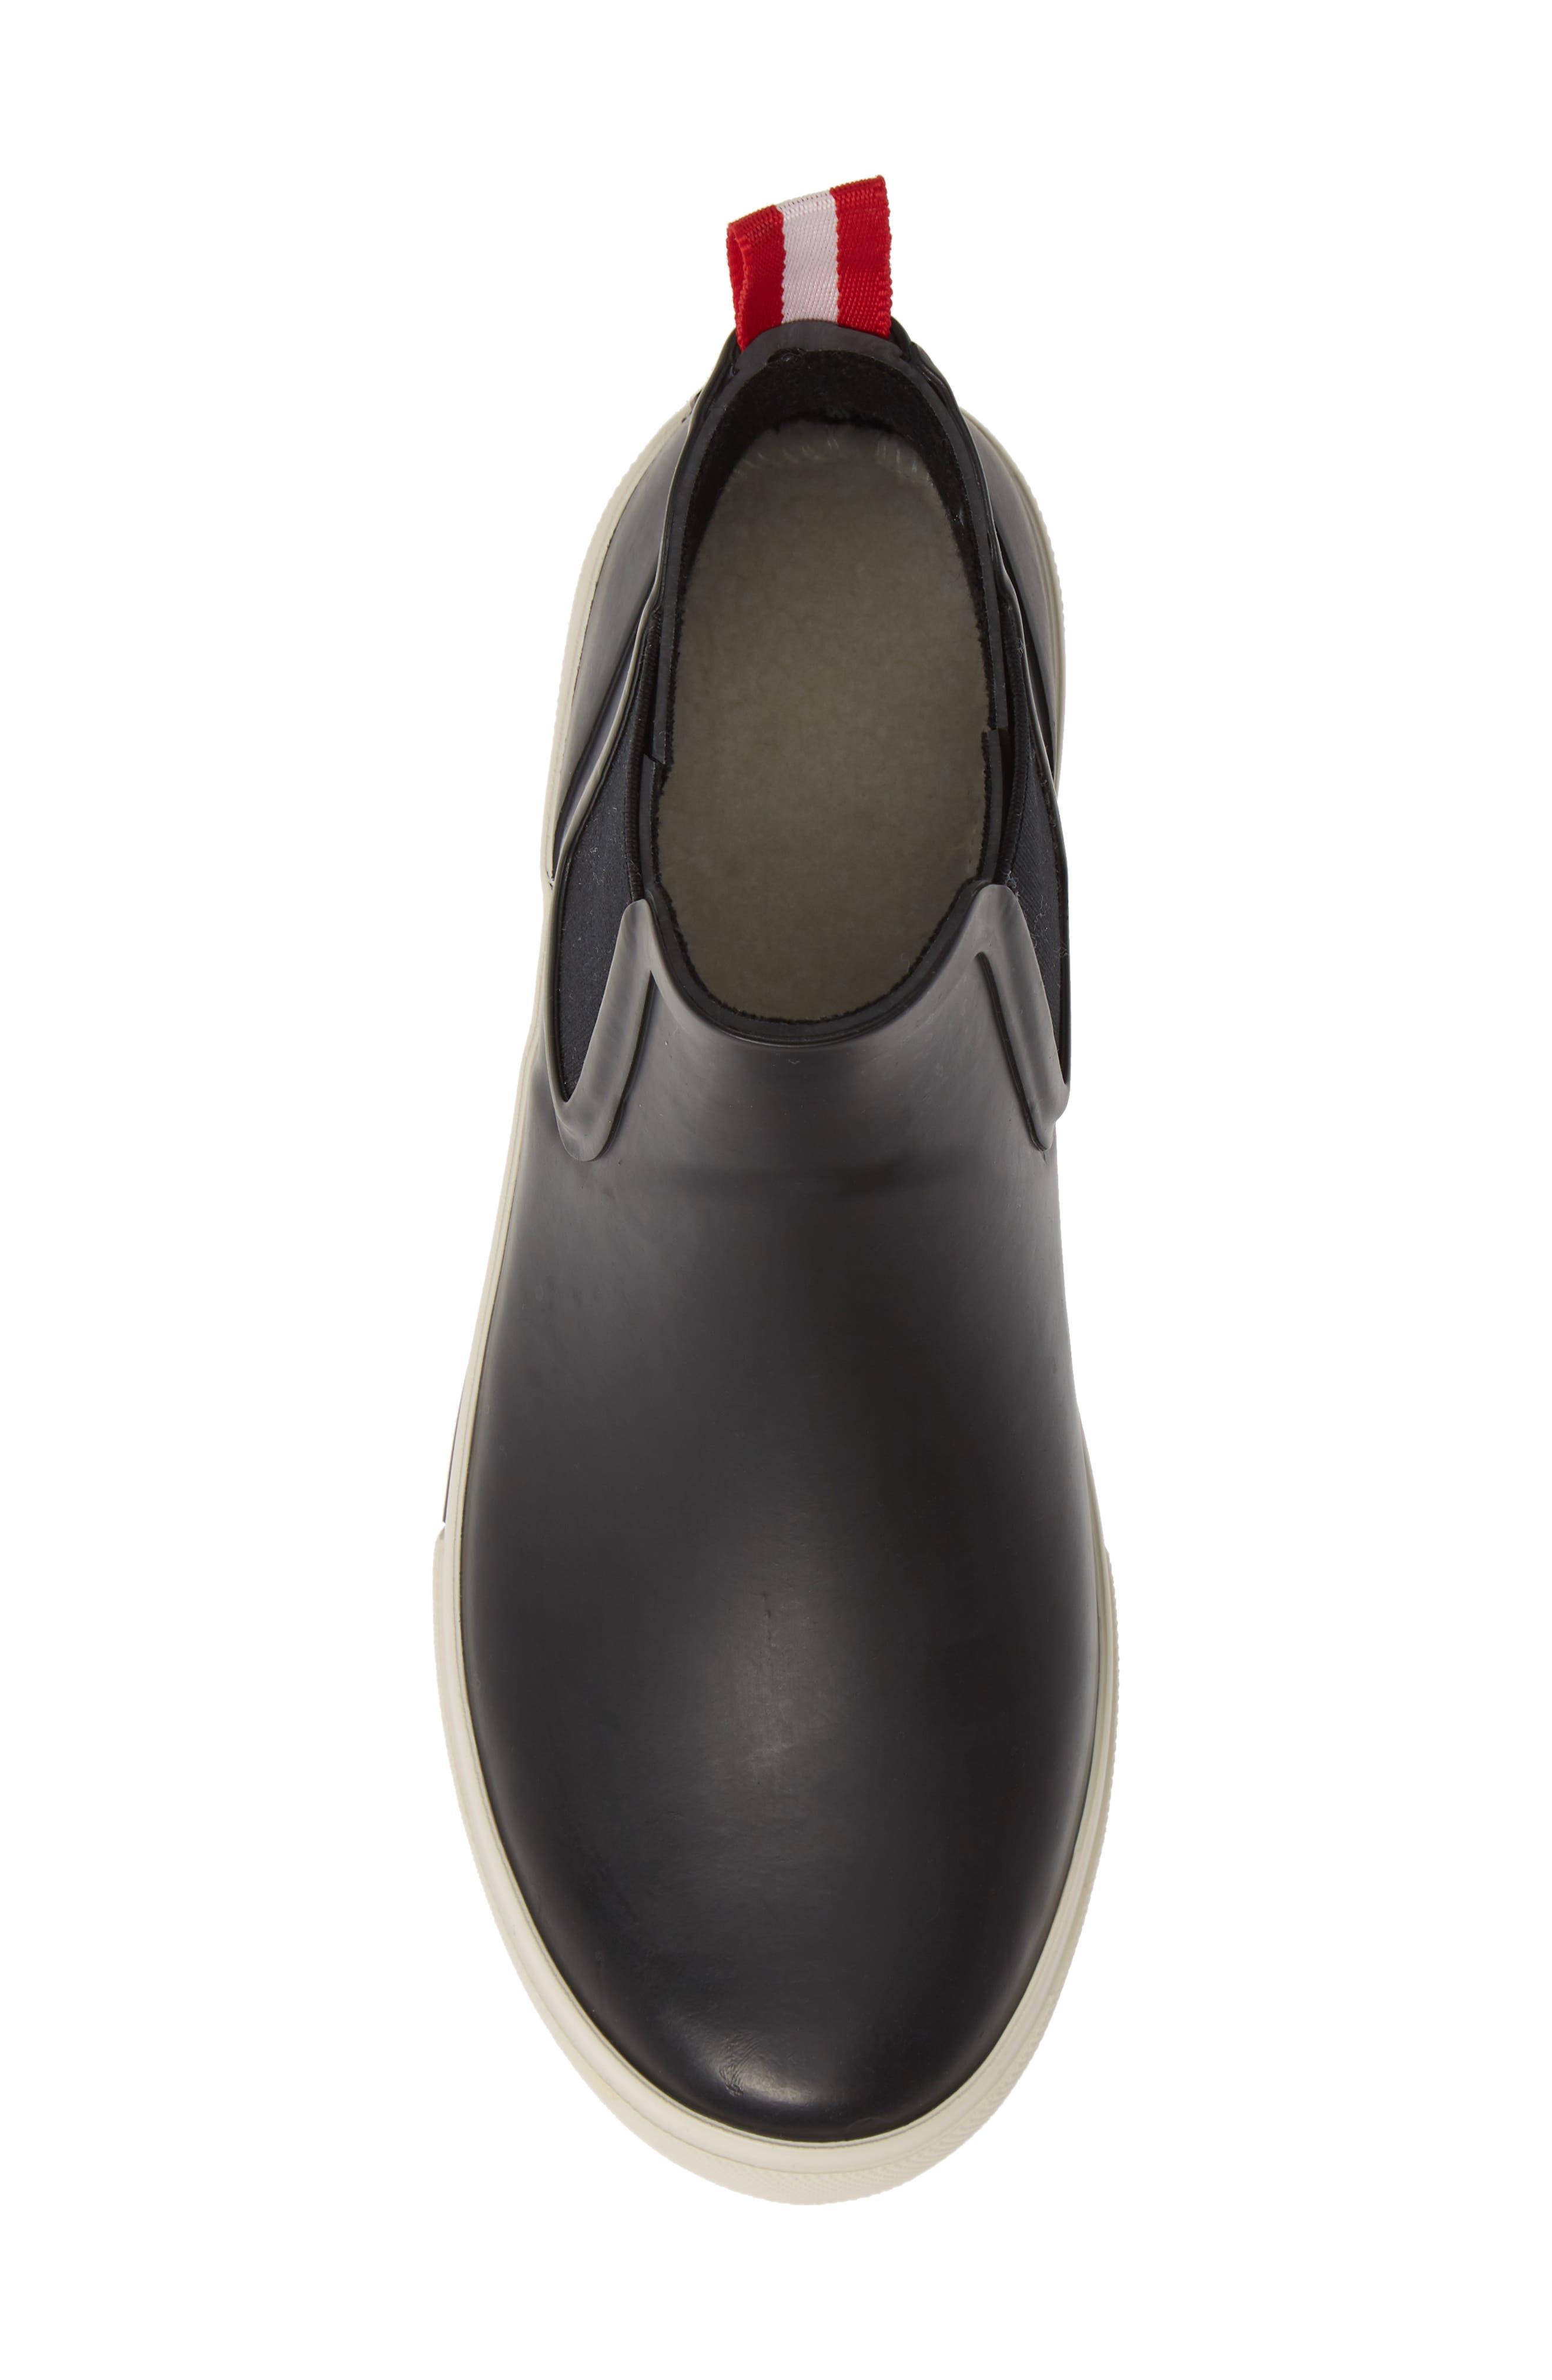 JOULES, Rainwell Waterproof Chelsea Rain Boot, Alternate thumbnail 5, color, BLACK